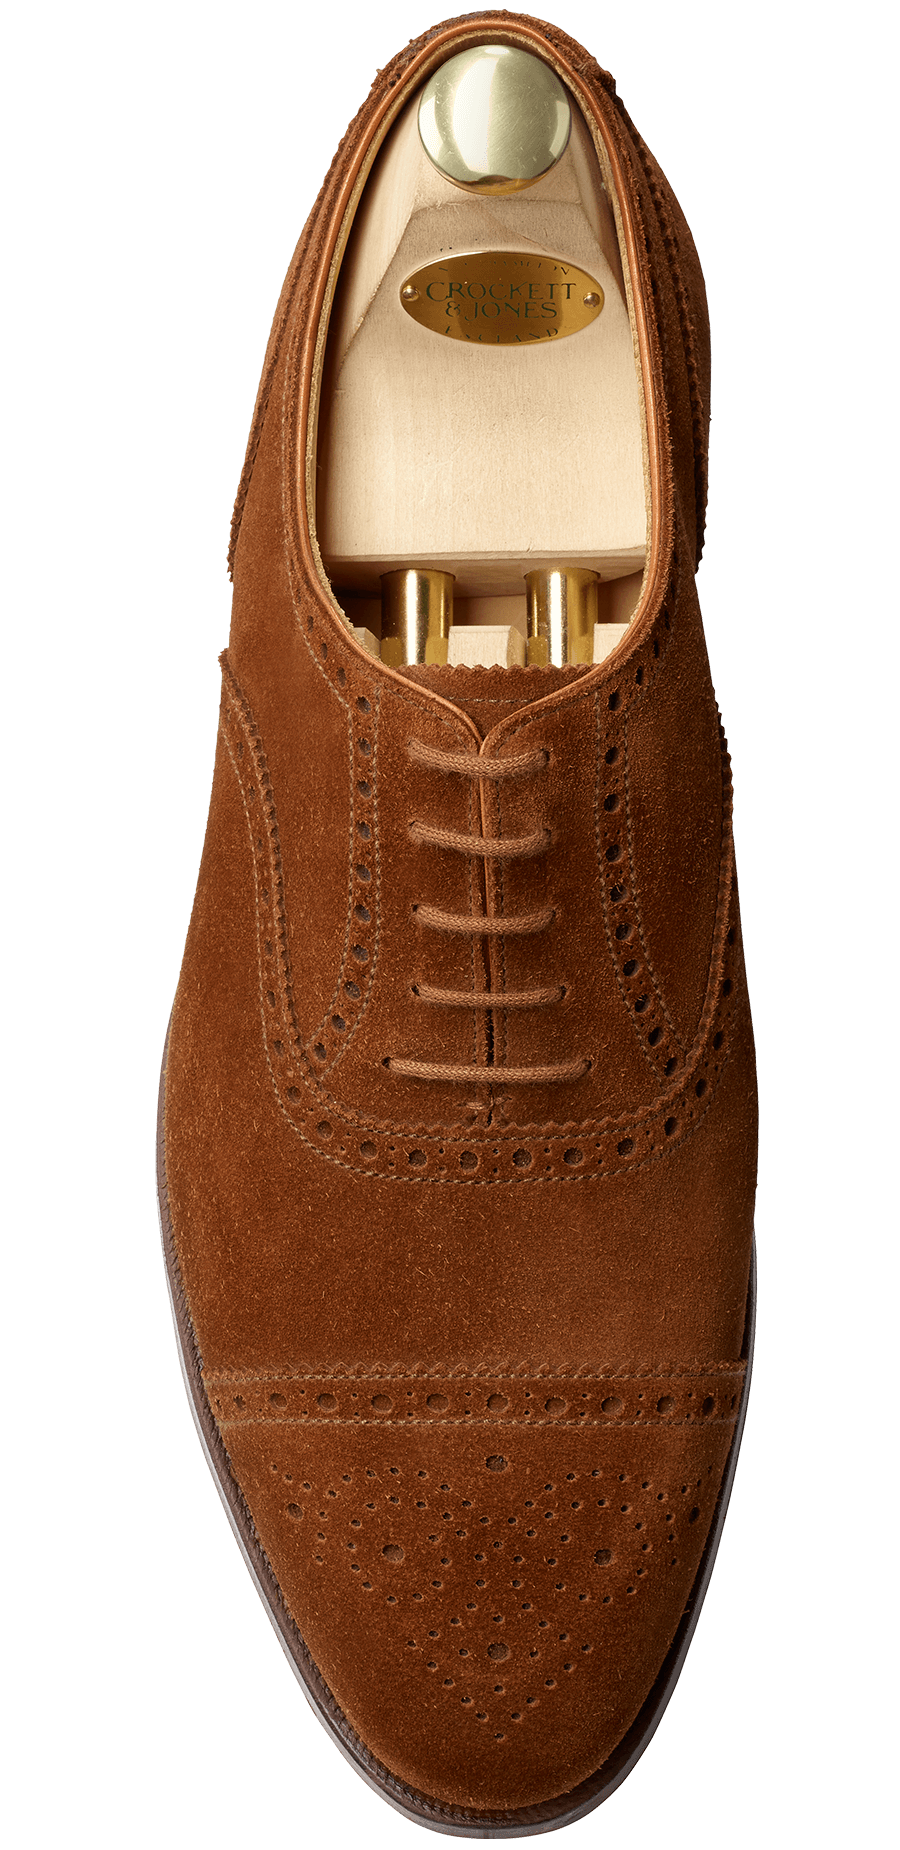 b2d43c93cd8 Westfield Tobacco Suede | Crockett & Jones | Footwear | Suede shoes ...